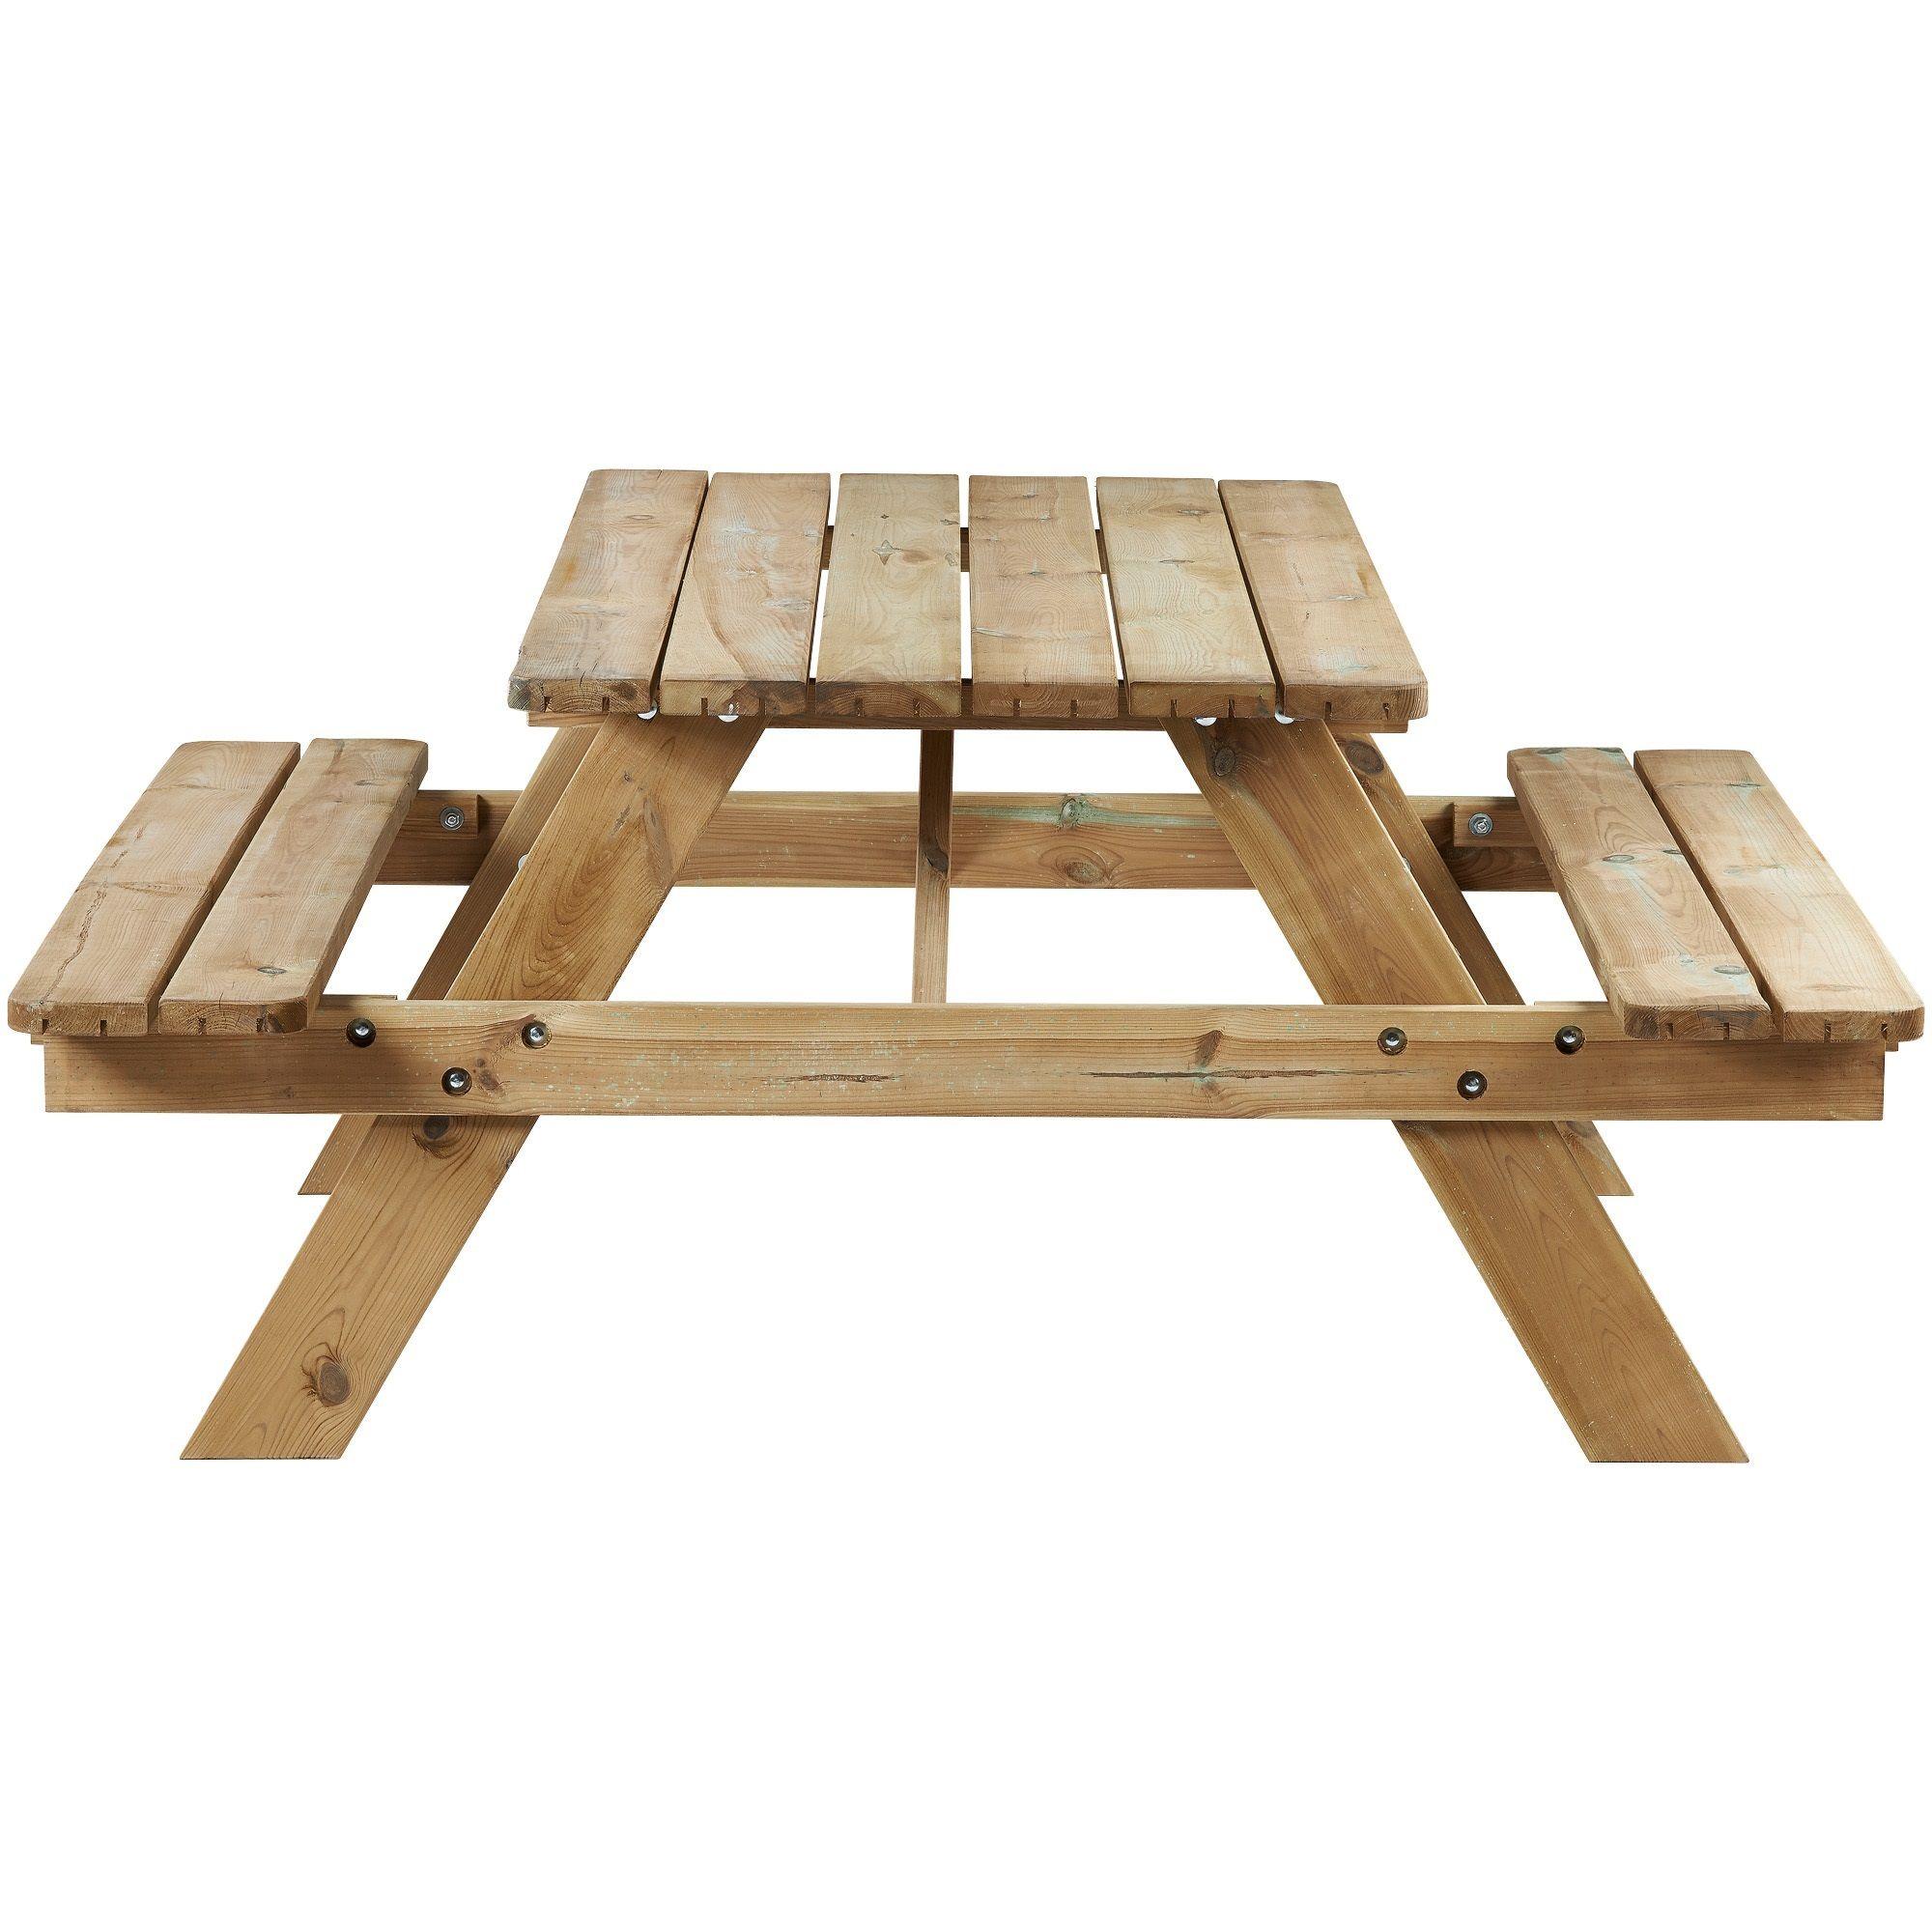 Houten Tuintafel Met Bankjes.Picknick Tafel Naturel Kwantum Tuin Picknicktafel Tuintafels